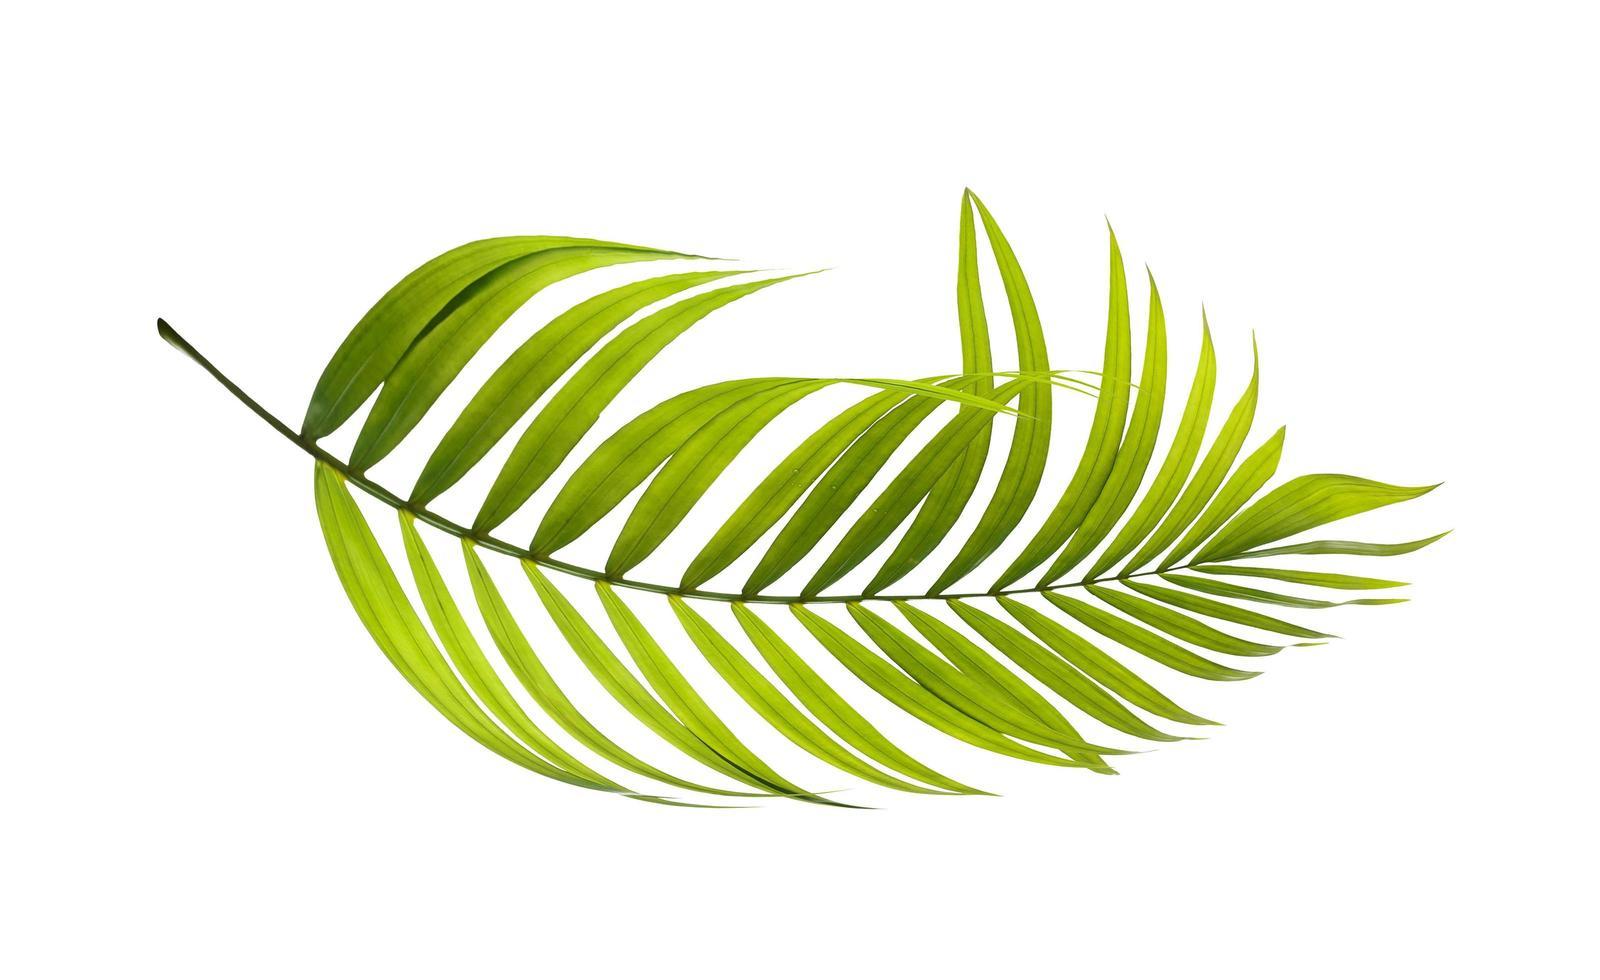 Curved green palm leaf photo